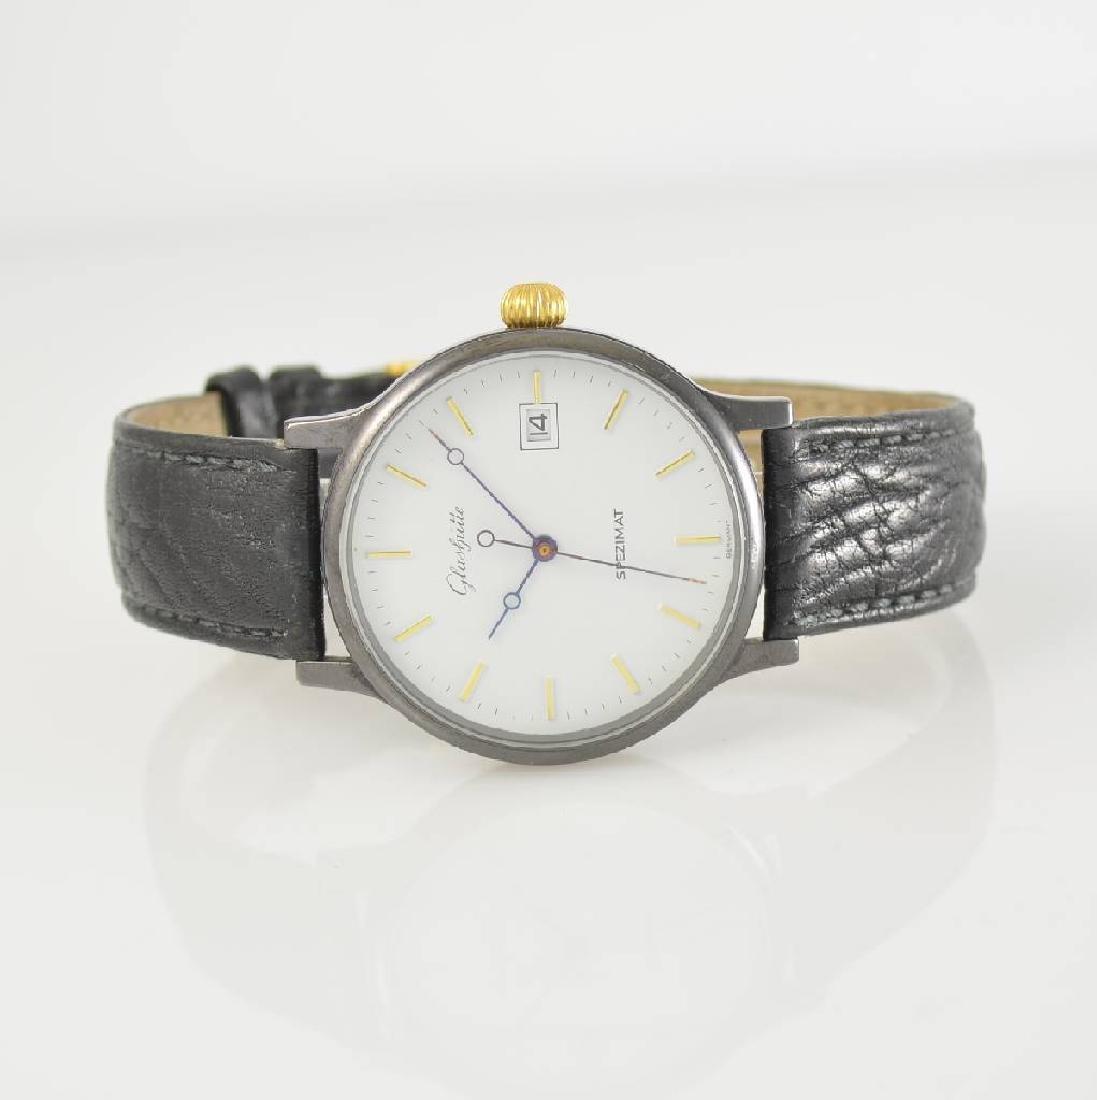 GLASHUTTE Spezimat calibre GUB 10-30 gents wristwatch